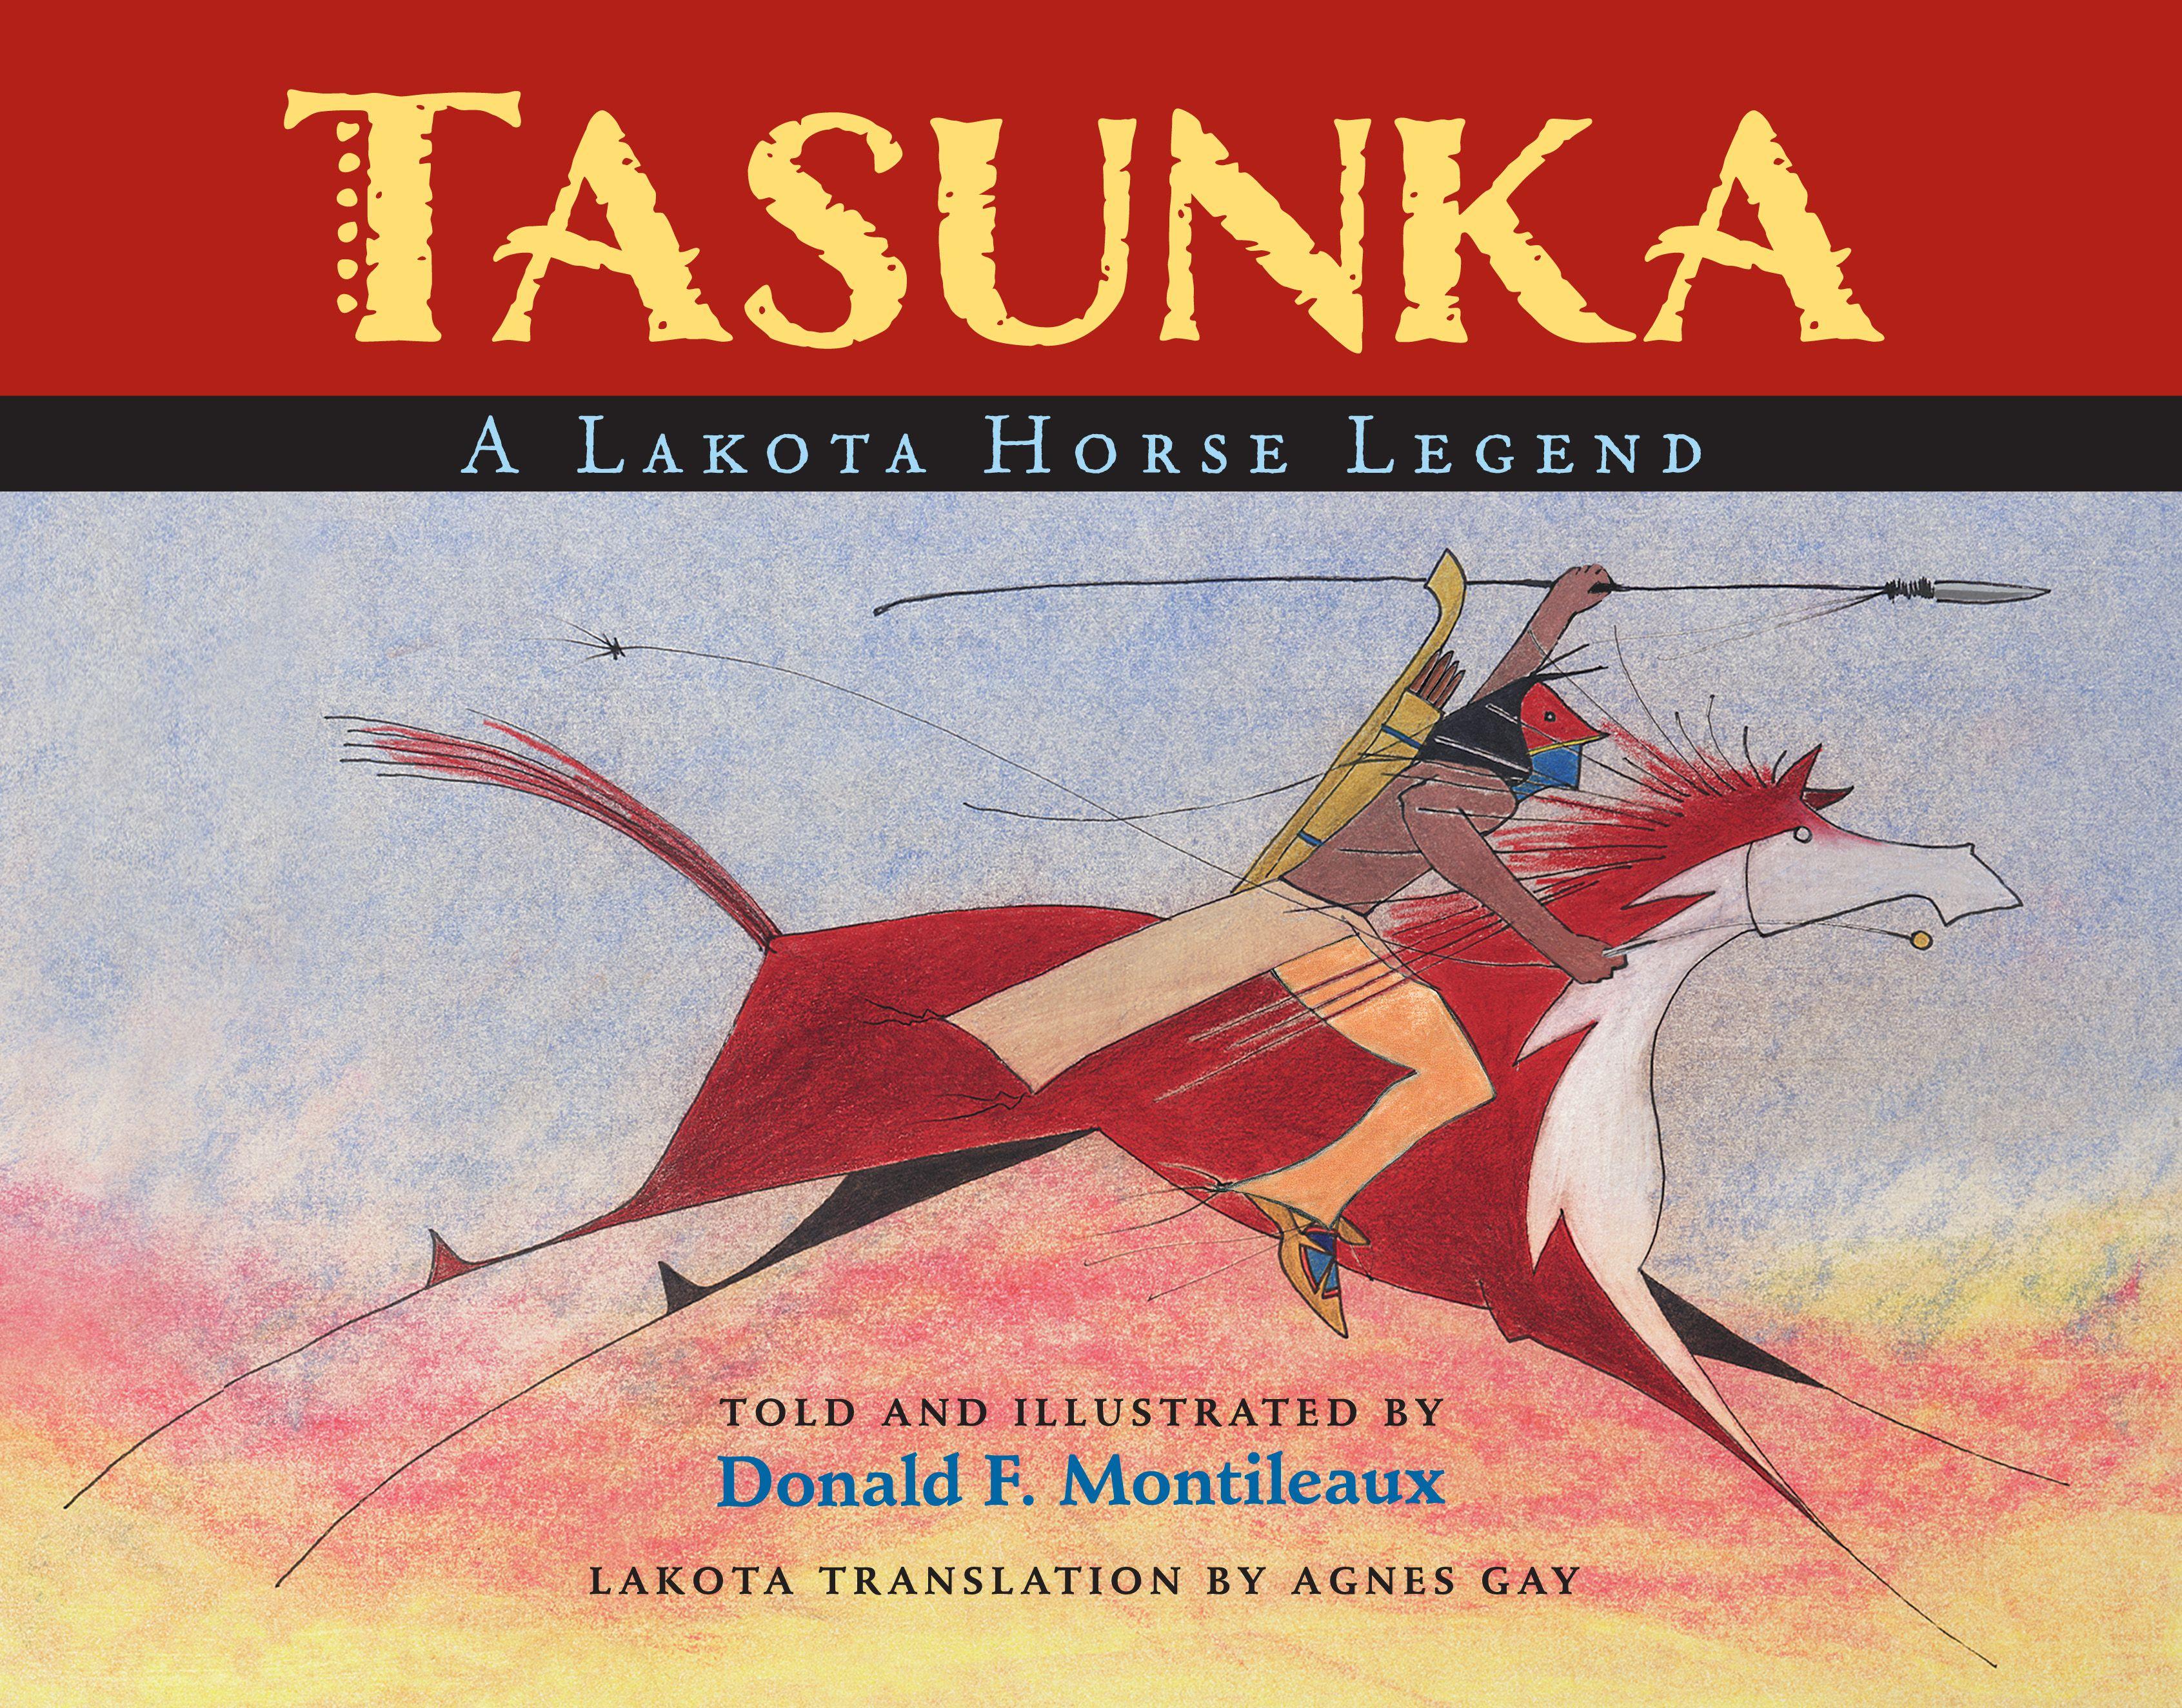 State Historical Society Tasunka Book Featured In